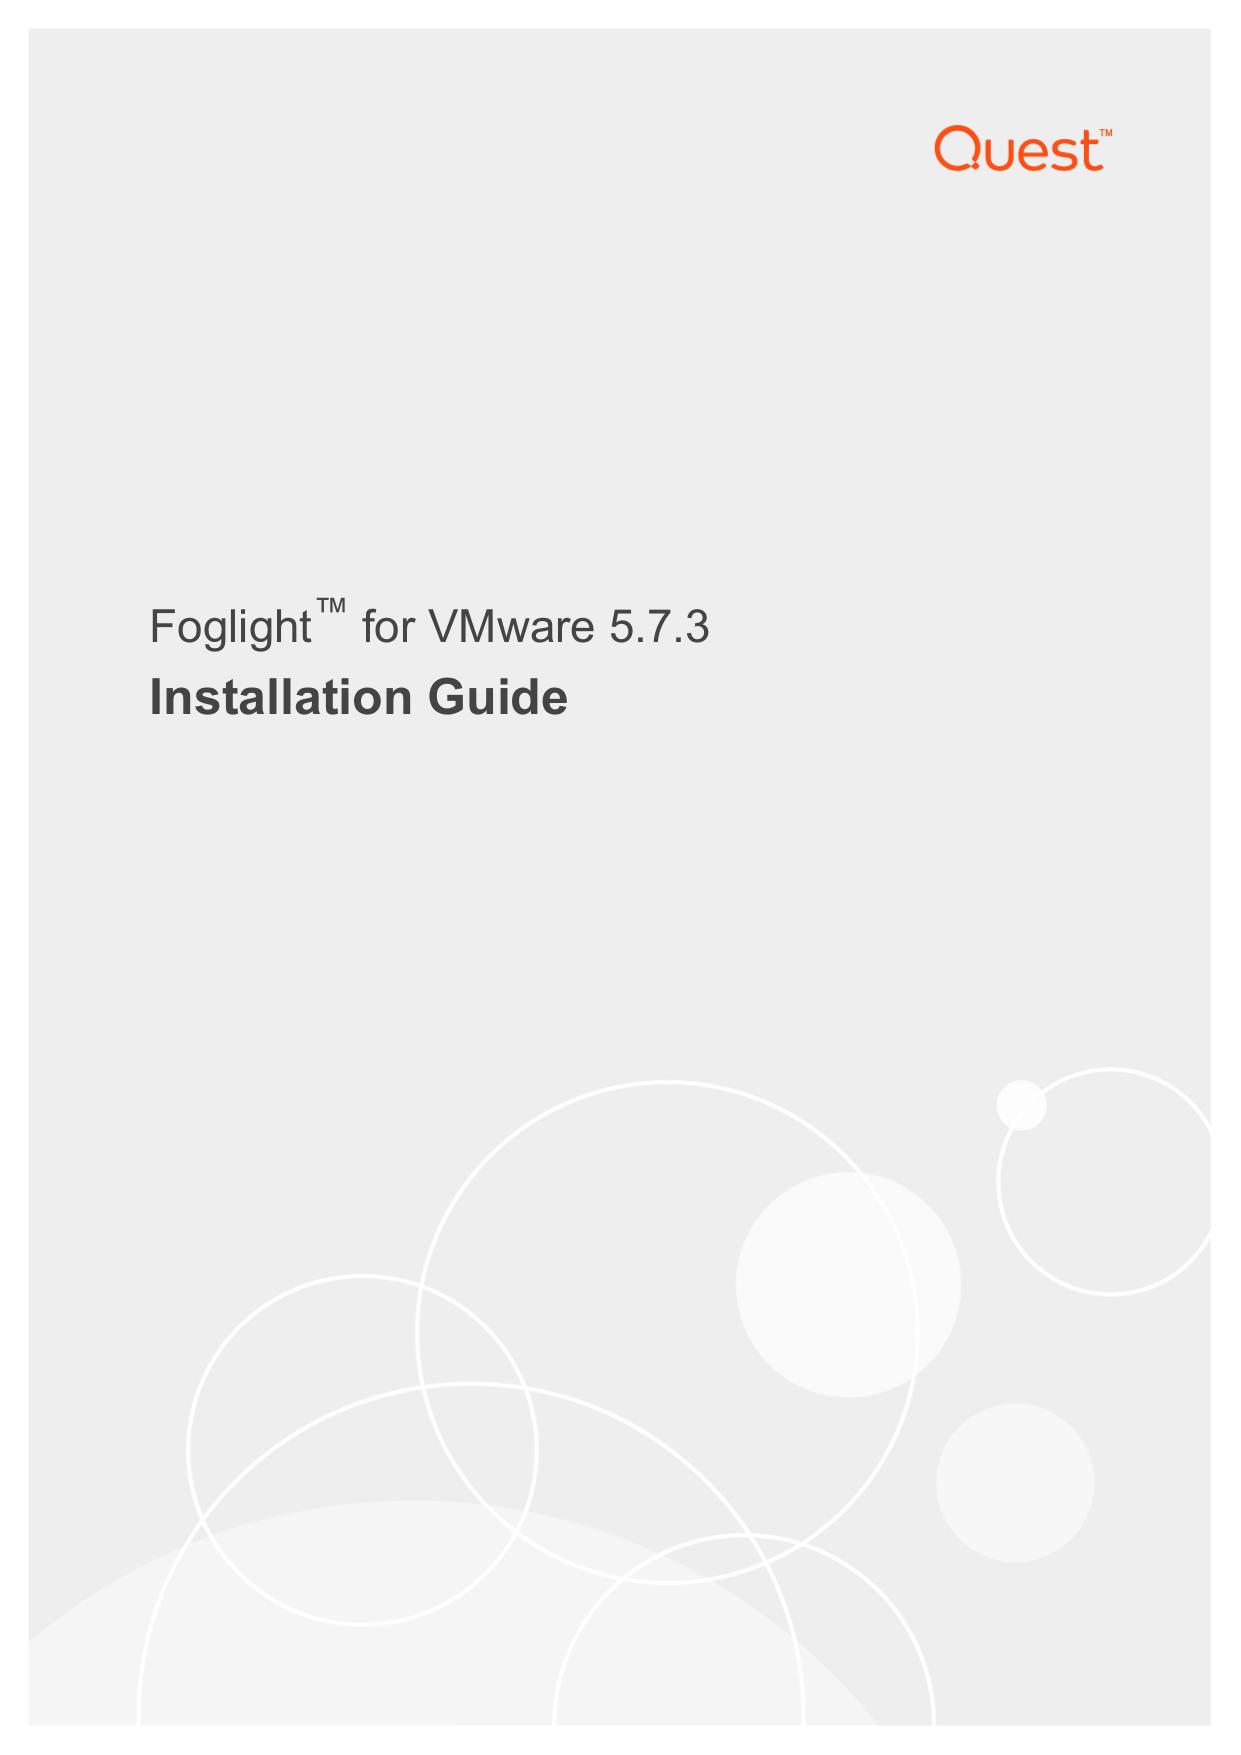 Foglight for VMware Installation Guide   manualzz com